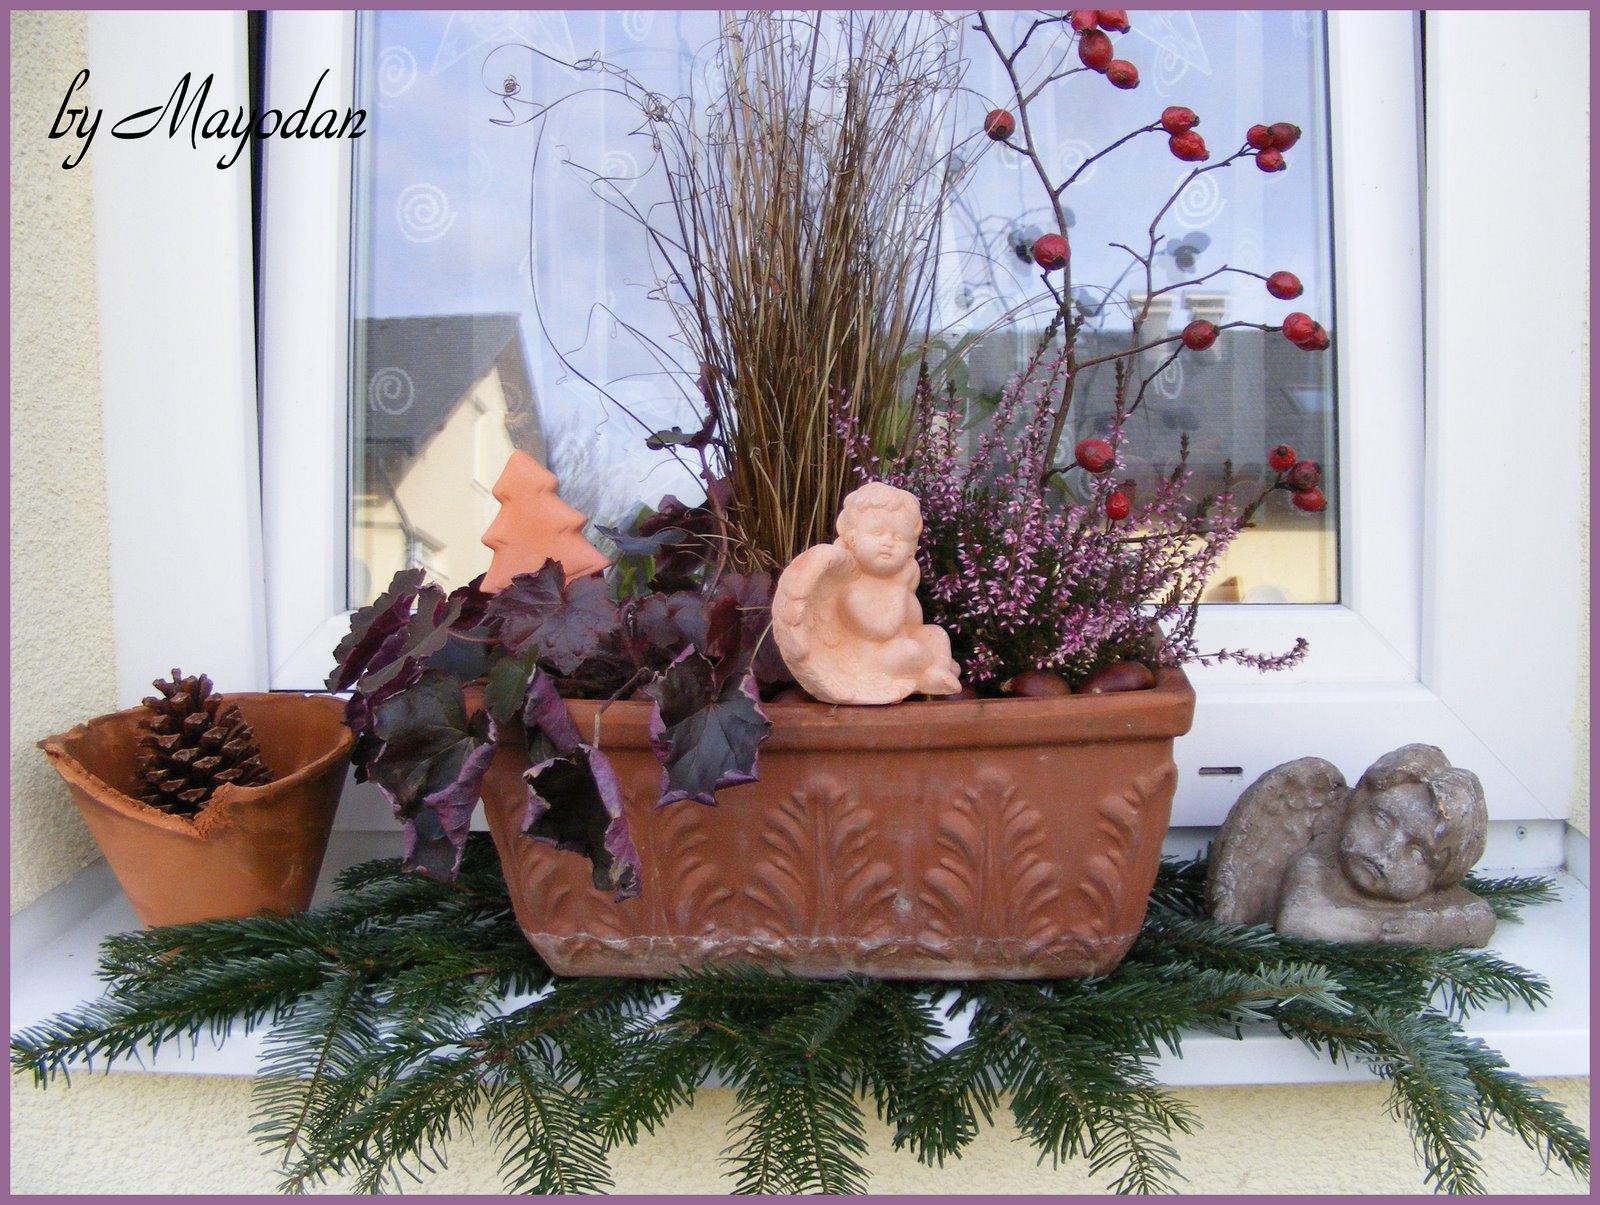 Mayodans garden & crafts: ~**~ erster advent ~**~